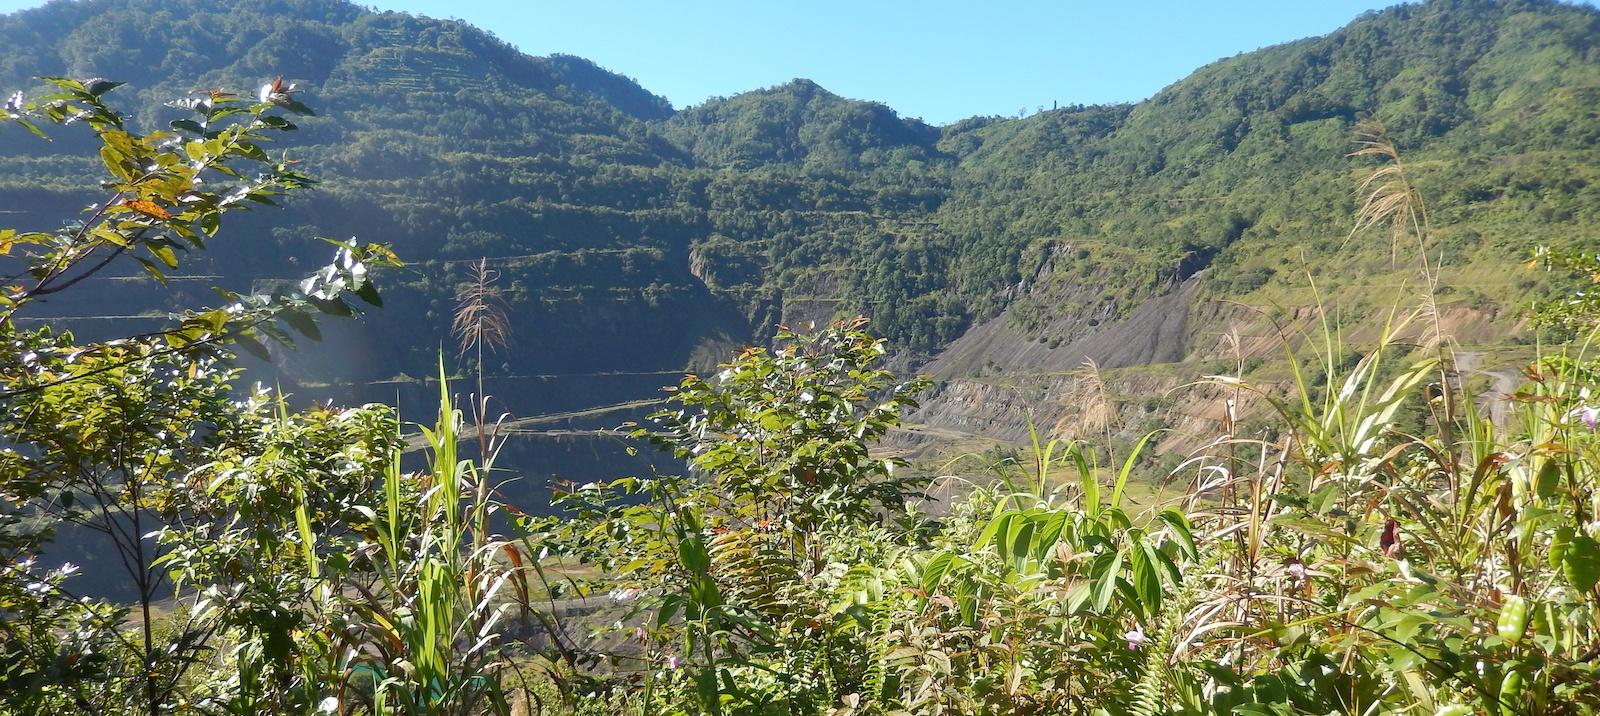 Panguna mine, Bougainville, 2016 (Photo: Annmaree O'Keeffe)